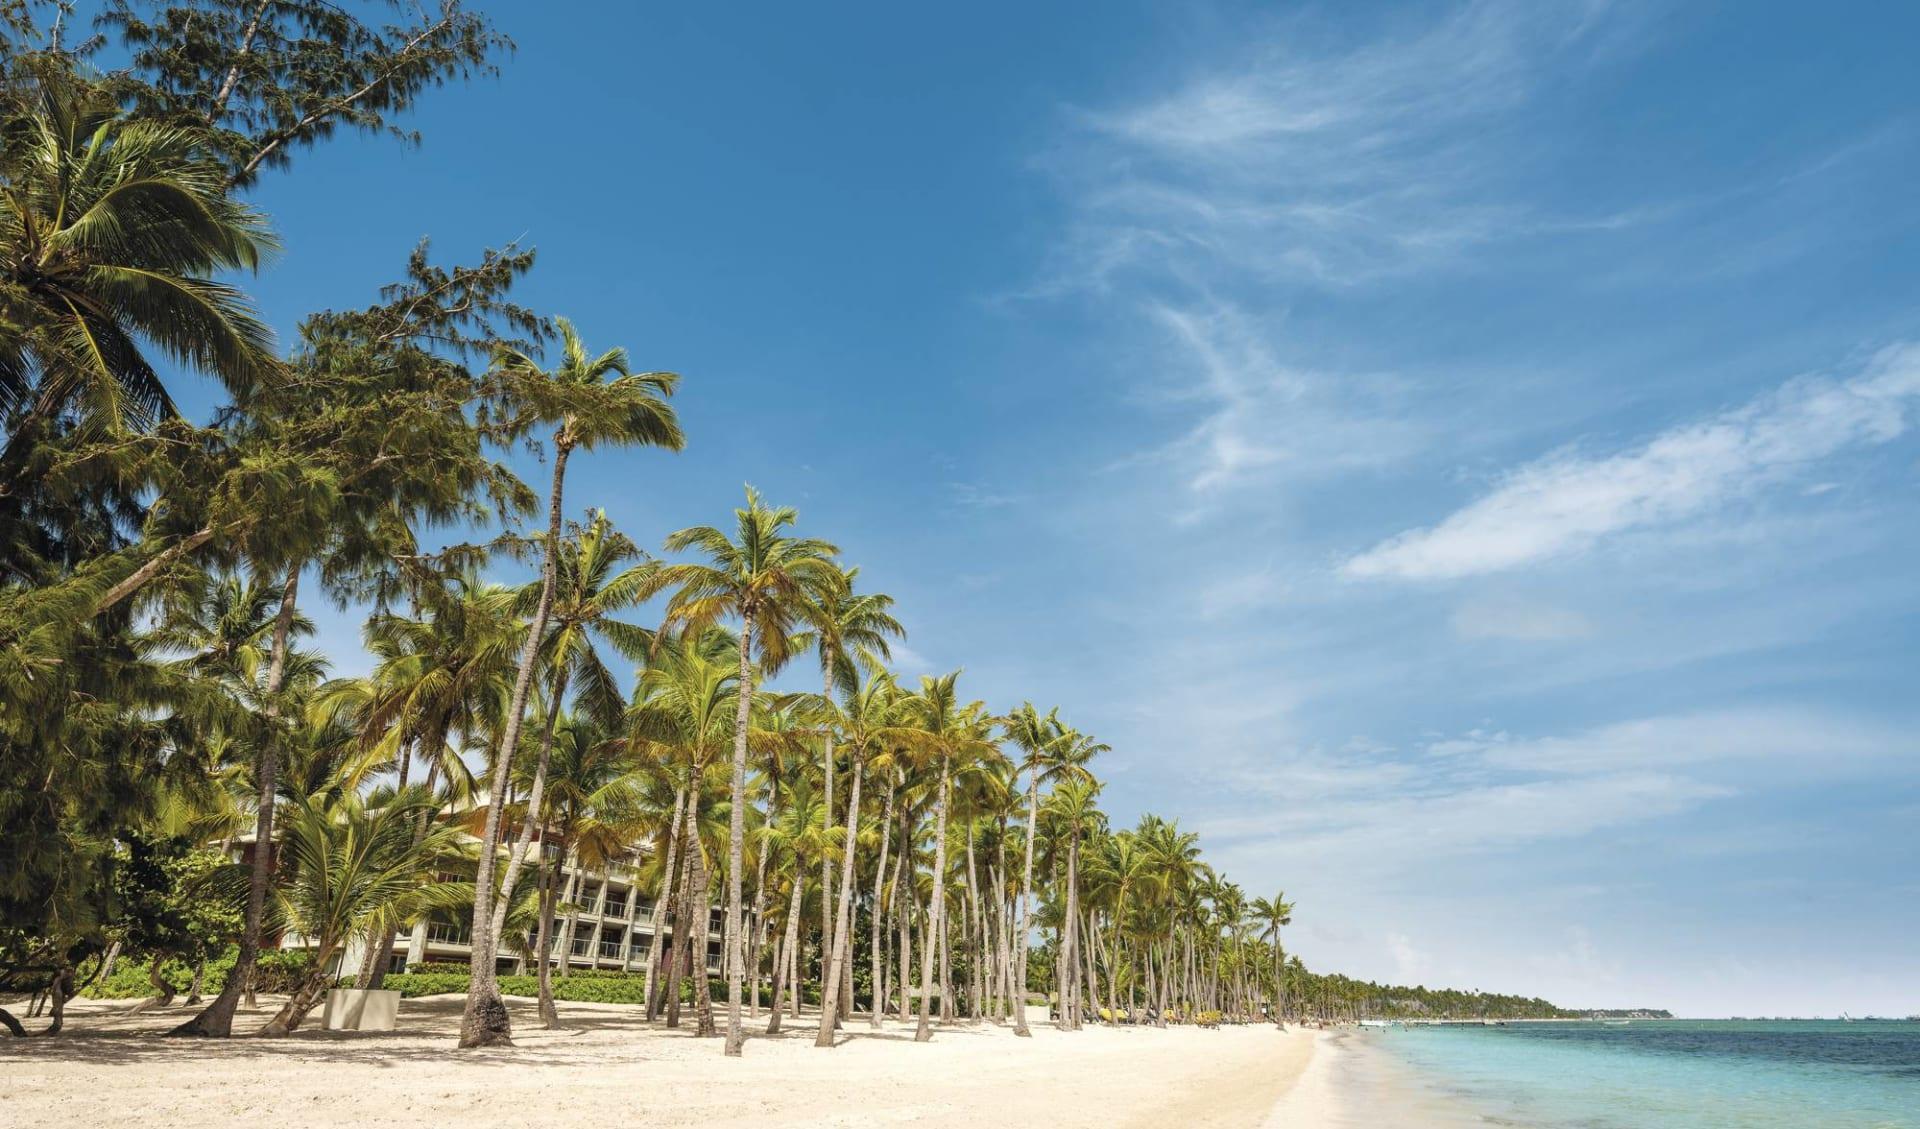 Barceló Bávaro Palace Deluxe in Punta Cana: Beach Bavaro Palace c Barcelo